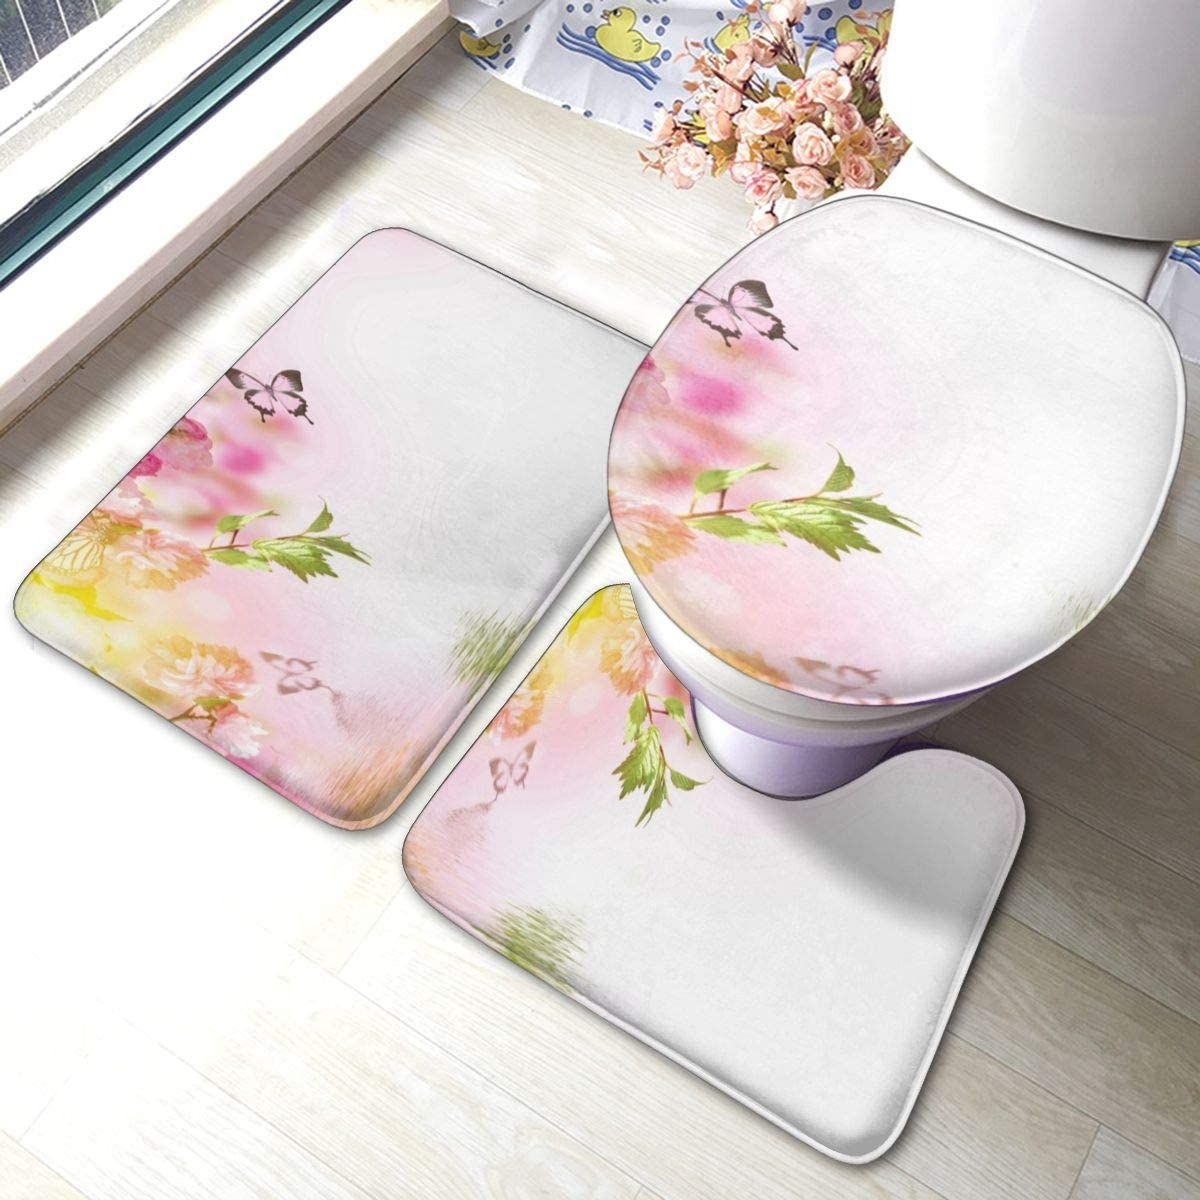 Amazon Com Bathroom Rugs Sets 3pc Flowers Amazing Spring Sakura With Butterflies Pink Non Slip Bath Bathroom Rugs Bathroom Rug Sets Bathroom Decor Accessories [ 1200 x 1200 Pixel ]